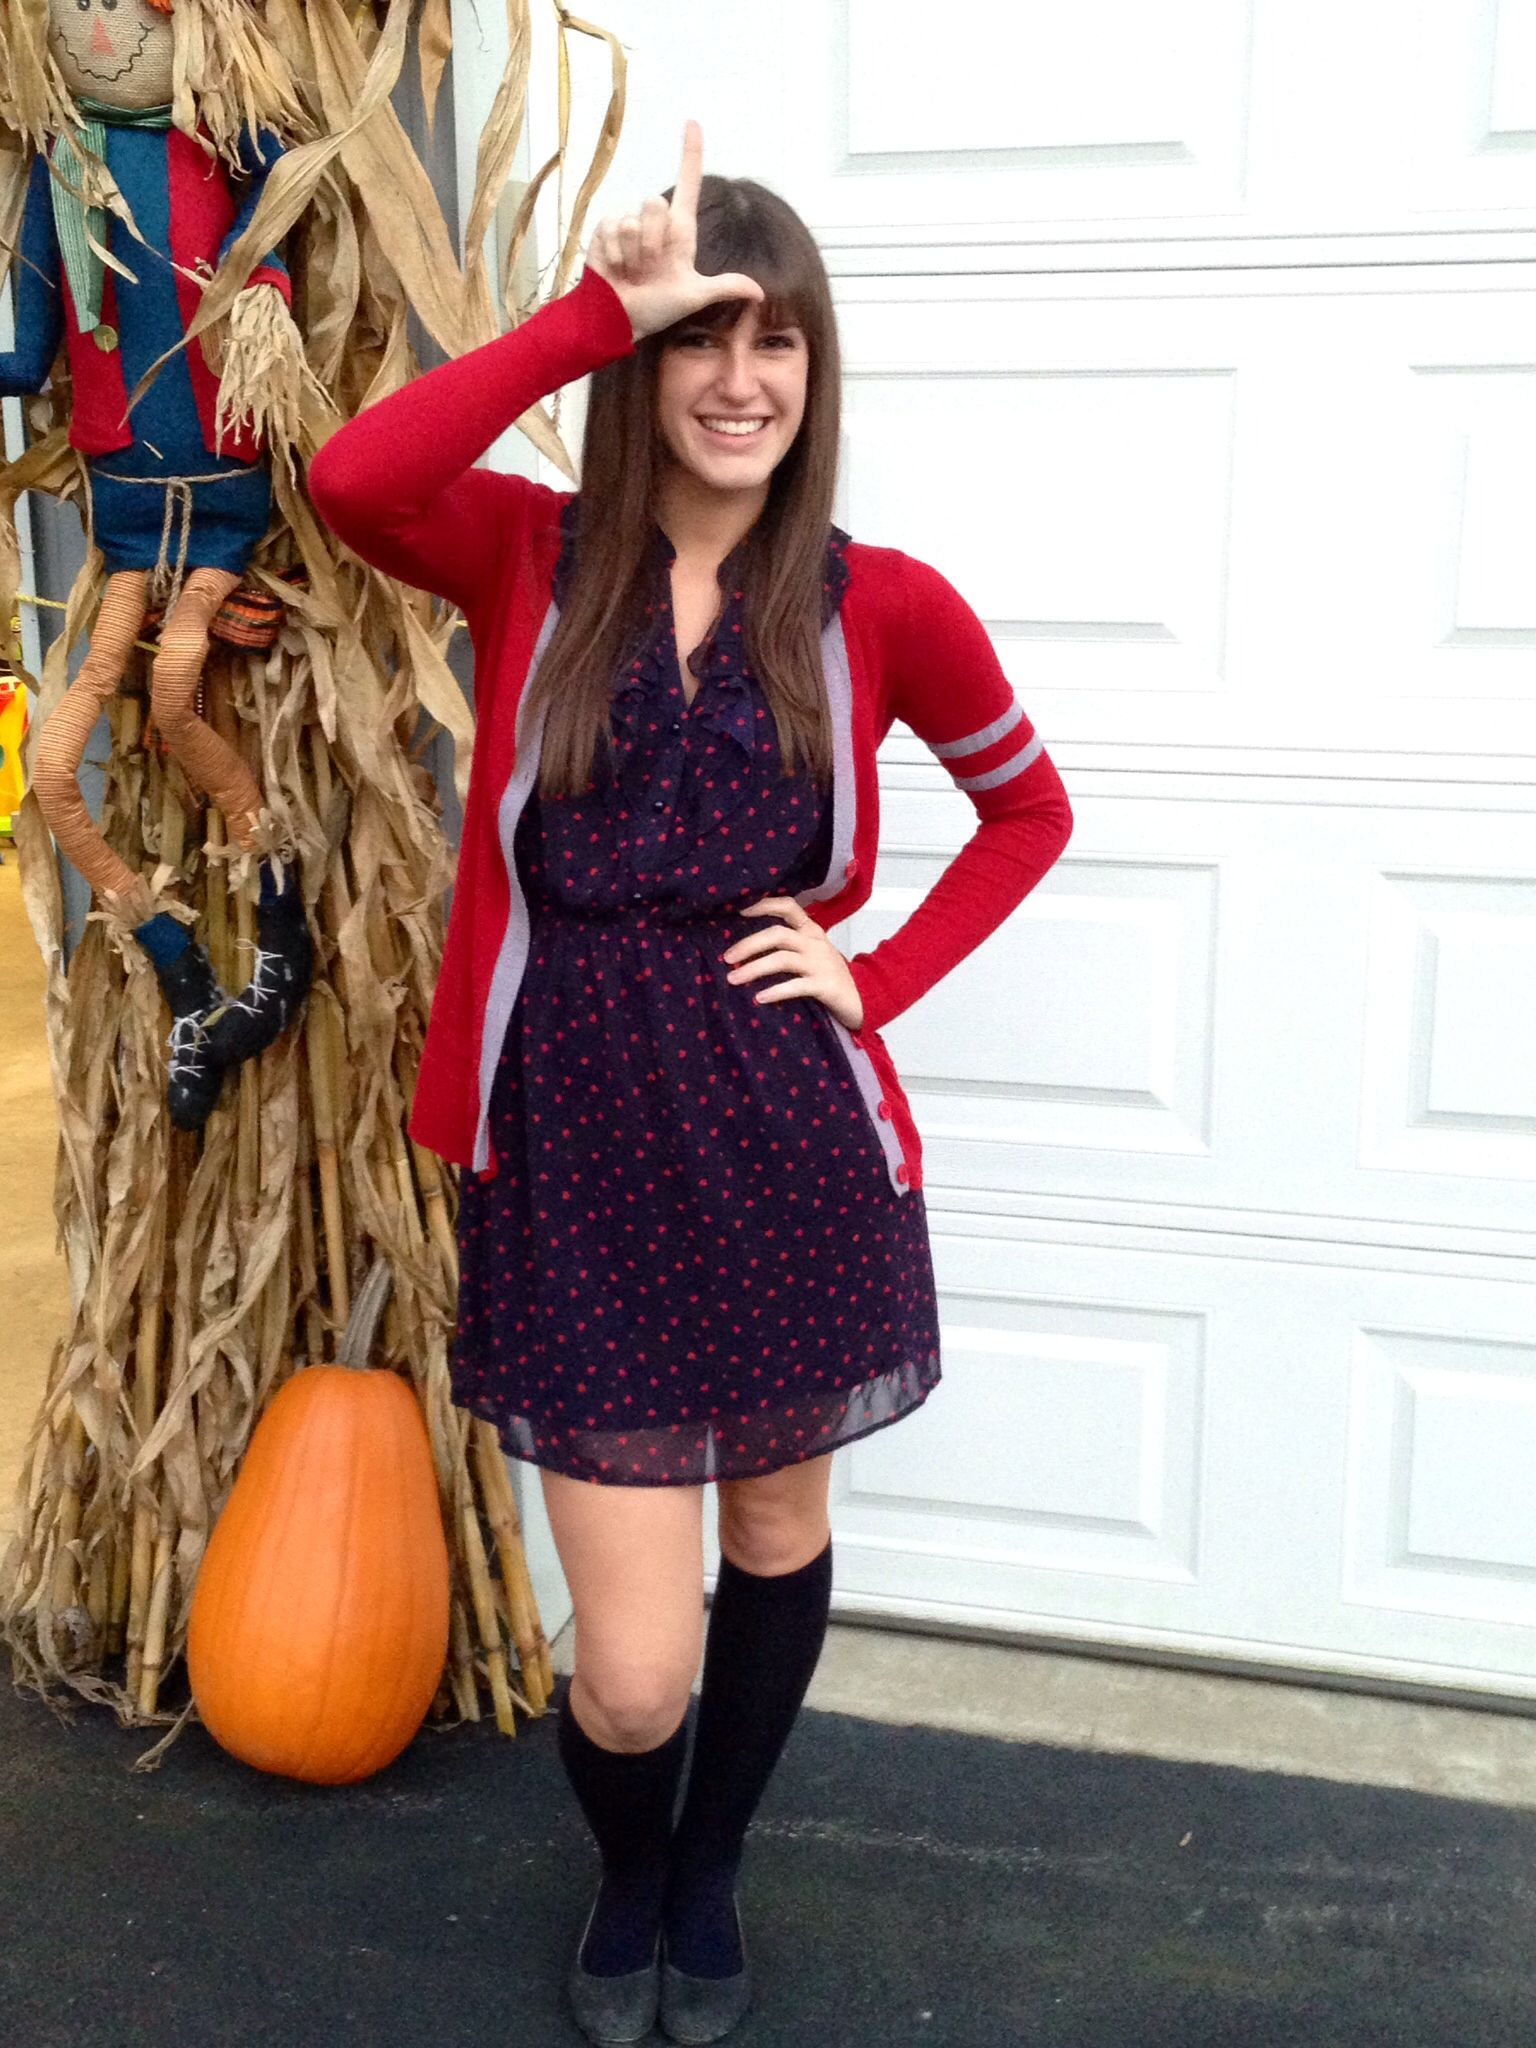 rachel berry costume glee diy this girl looks freakishly